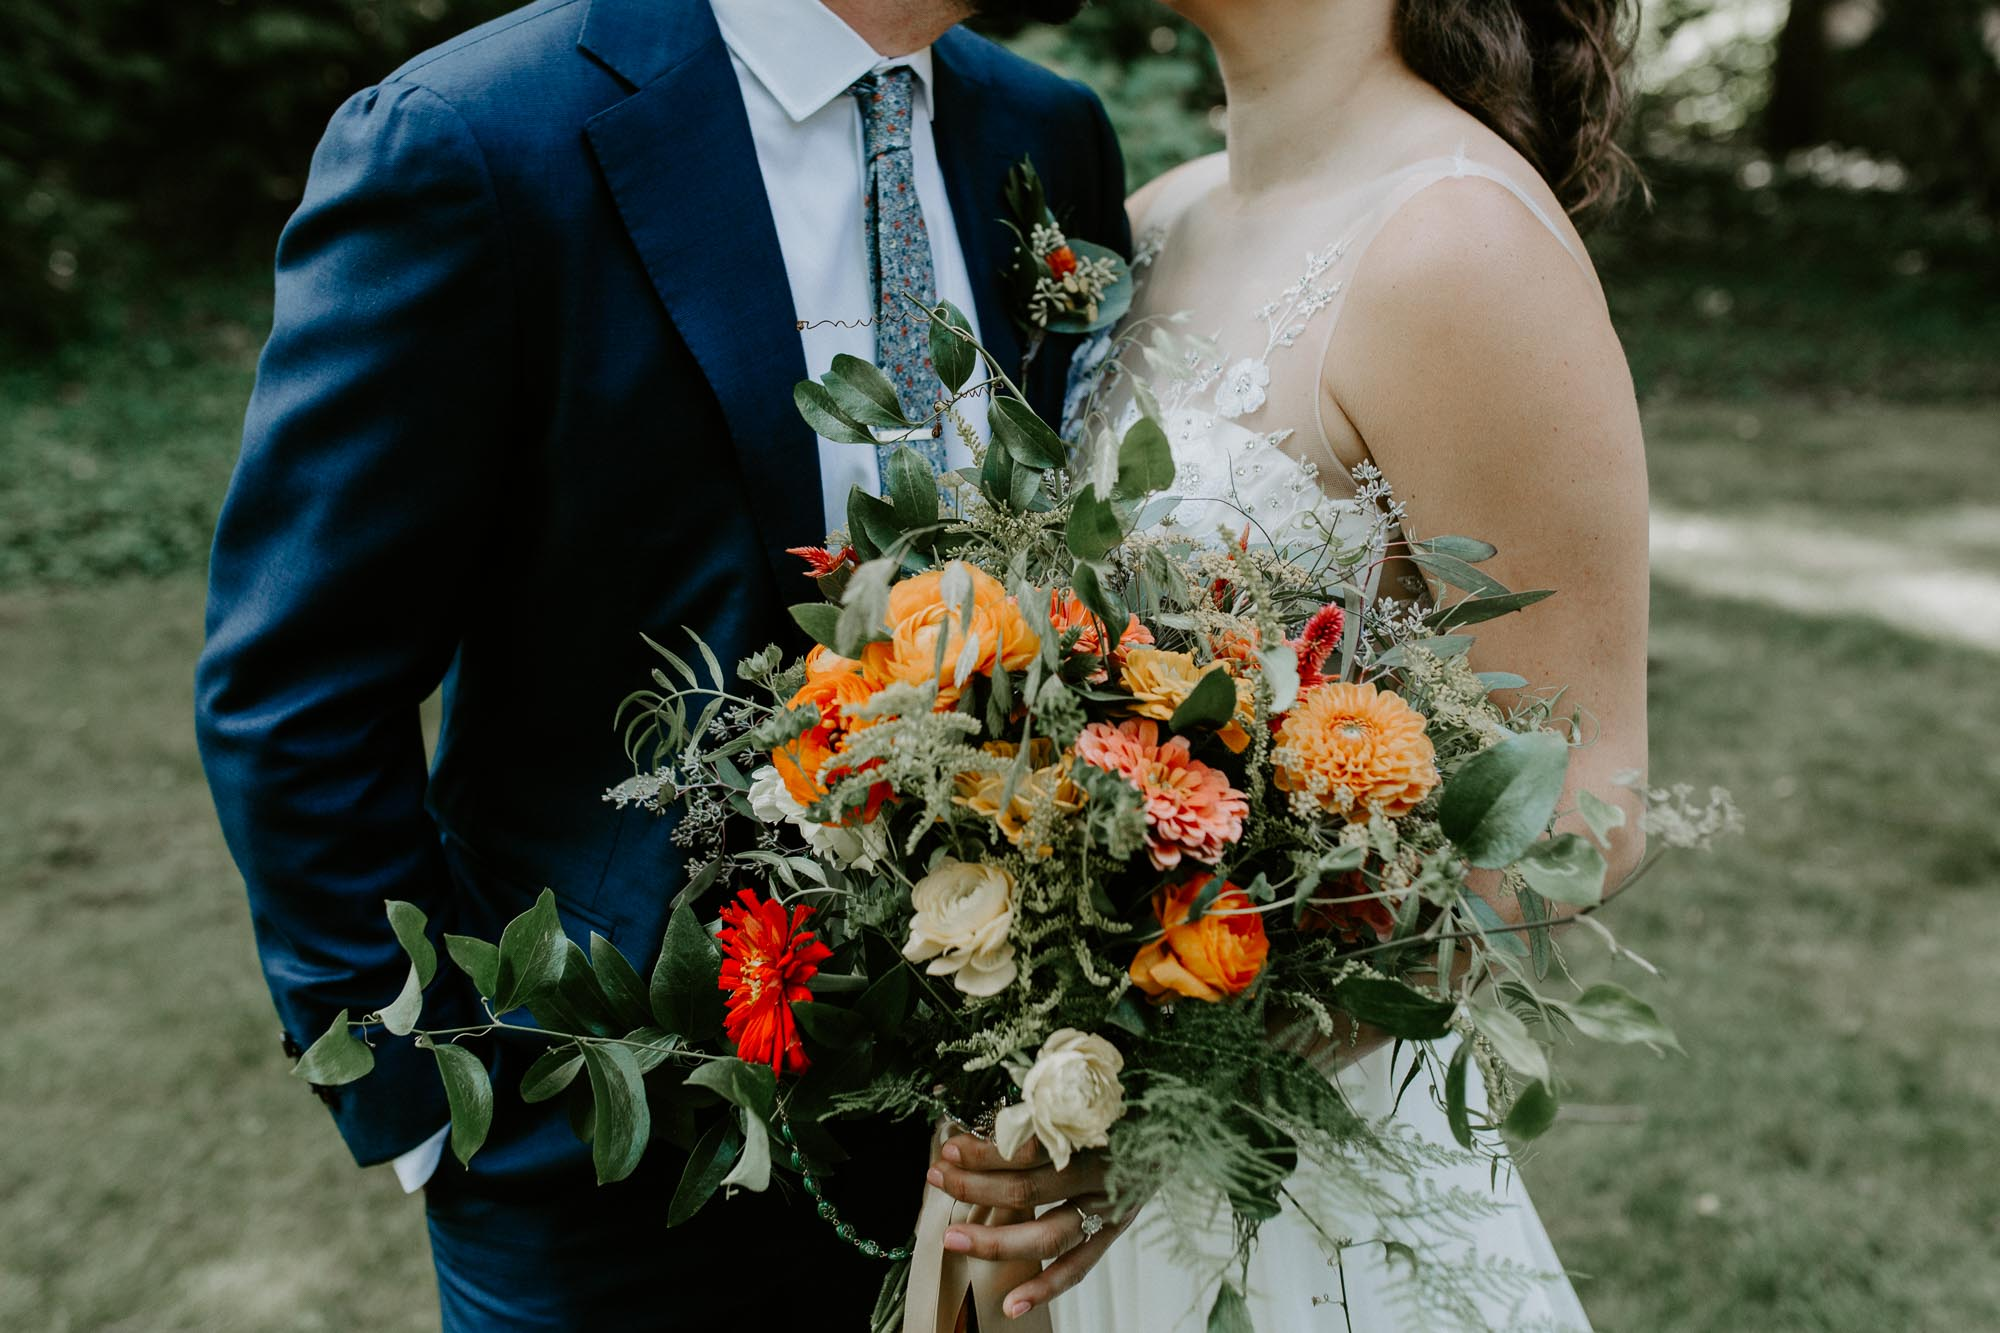 journeyman_distillery_wedding_photographer_chicago_il_wright_photographs-2279.jpg